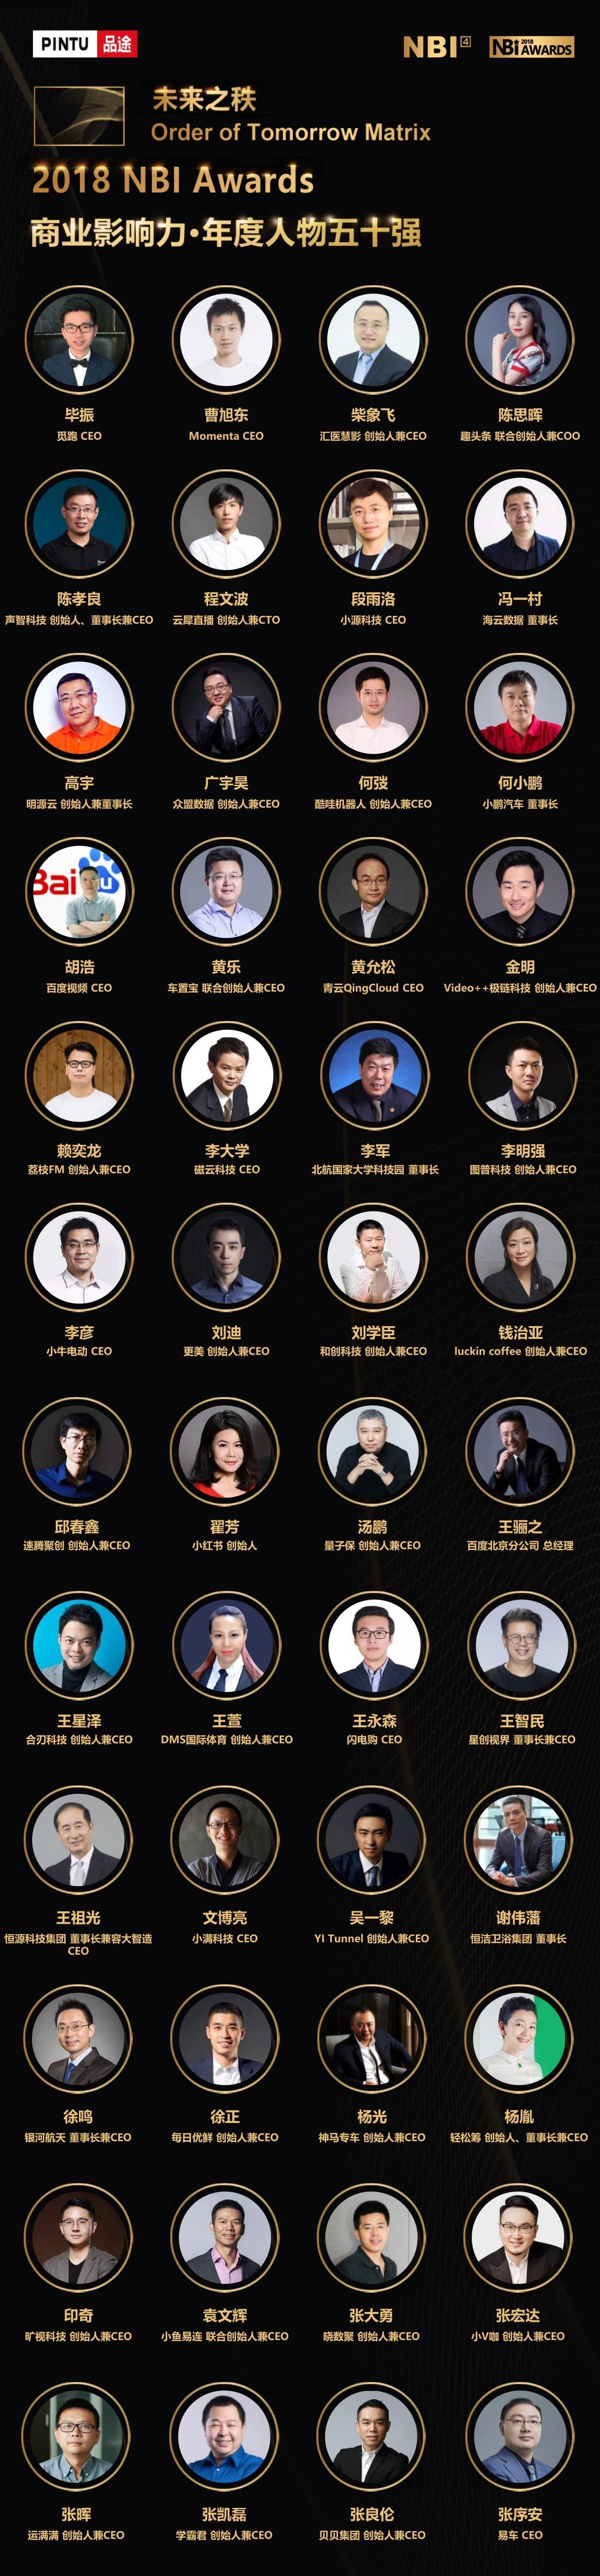 2018NBI商业影响力年度人物五十强榜单:图普科技CEO李明强入榜